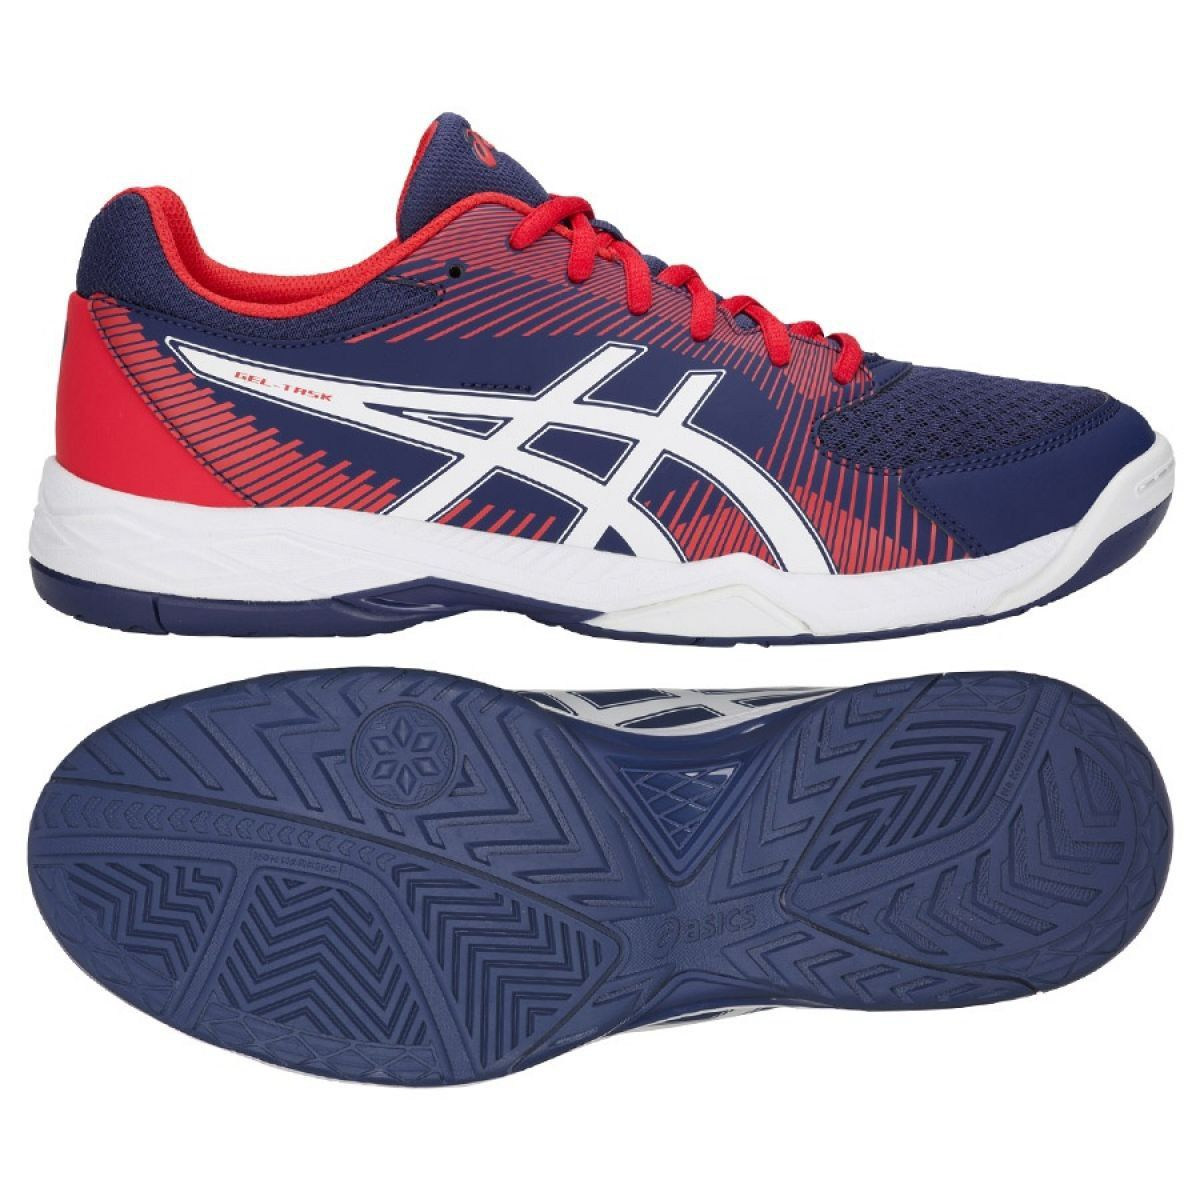 Buty Do Siatkowki Asics Gel Task M B704y 400 Granatowe Granatowe Volleyball Shoes Asics Volleyball Shoes Mens Volleyball Shoes